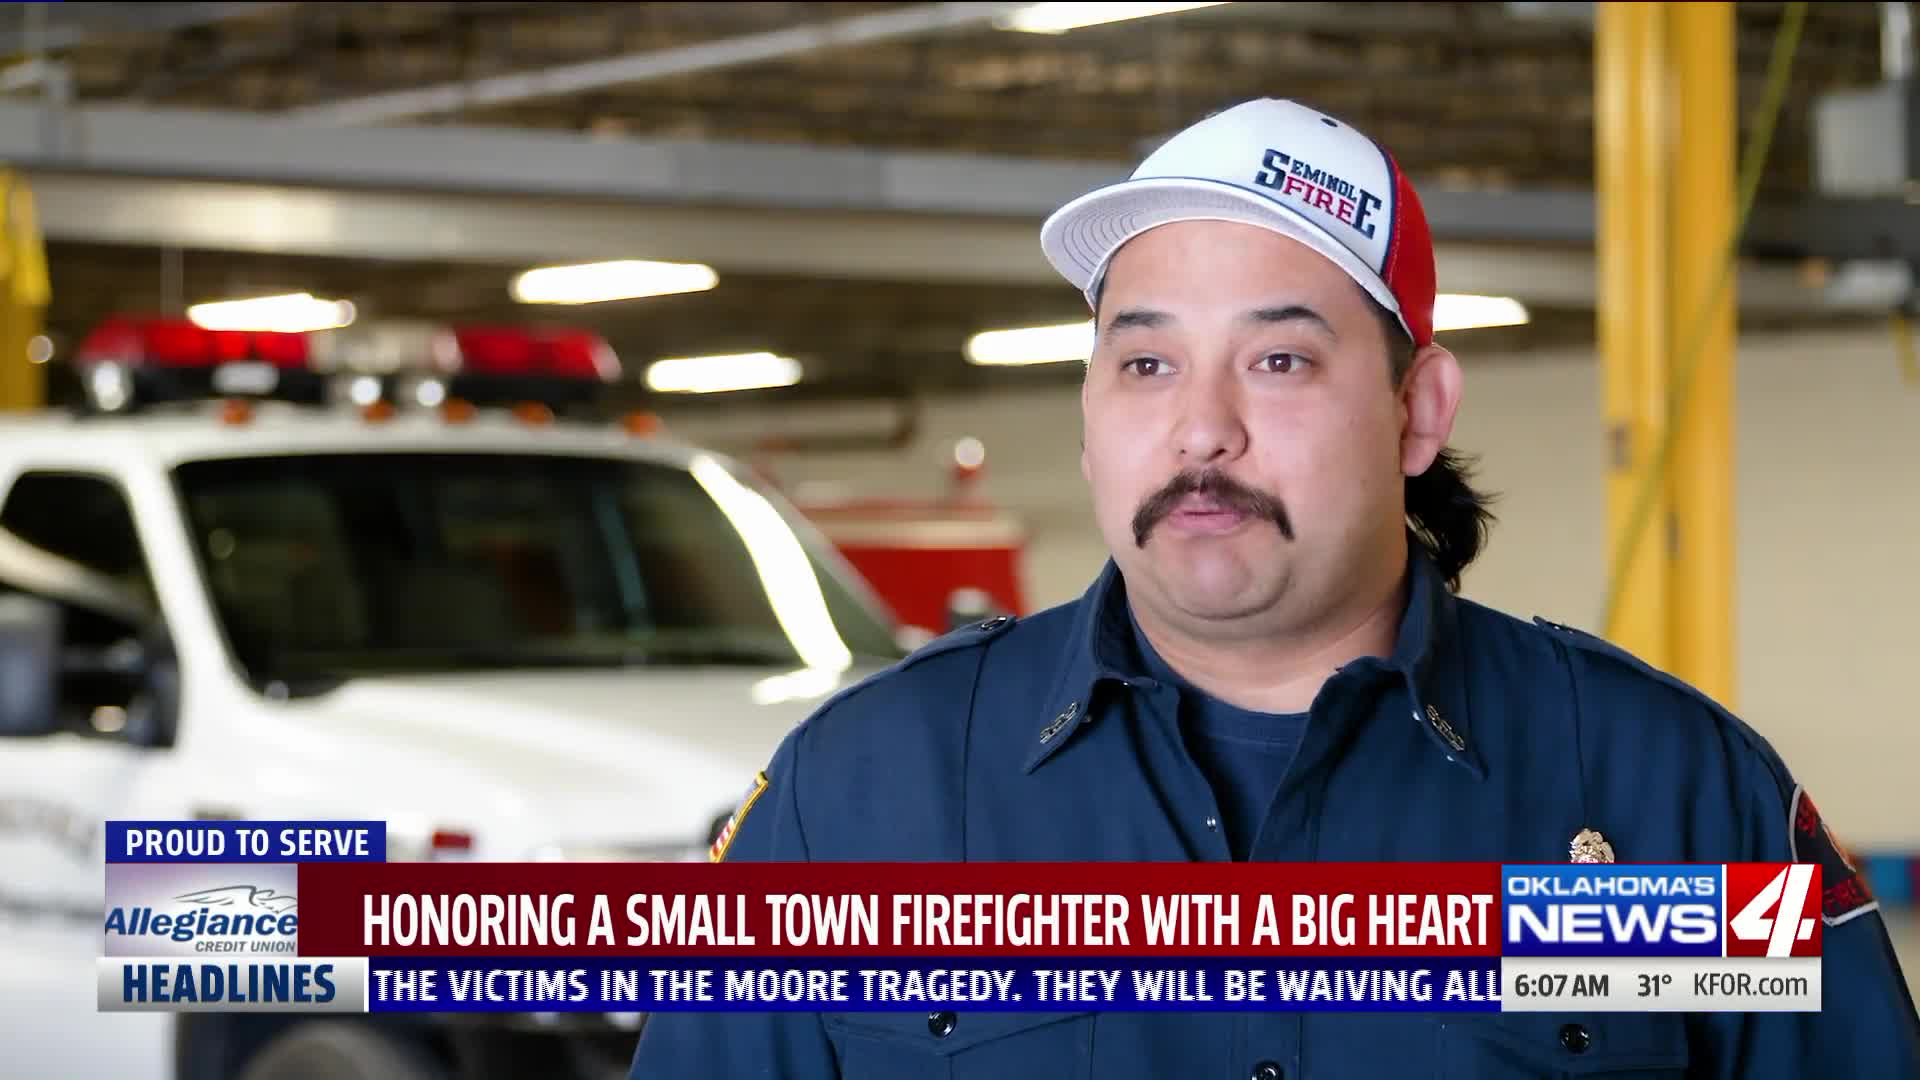 Seminole firefighter is Proud to Serve